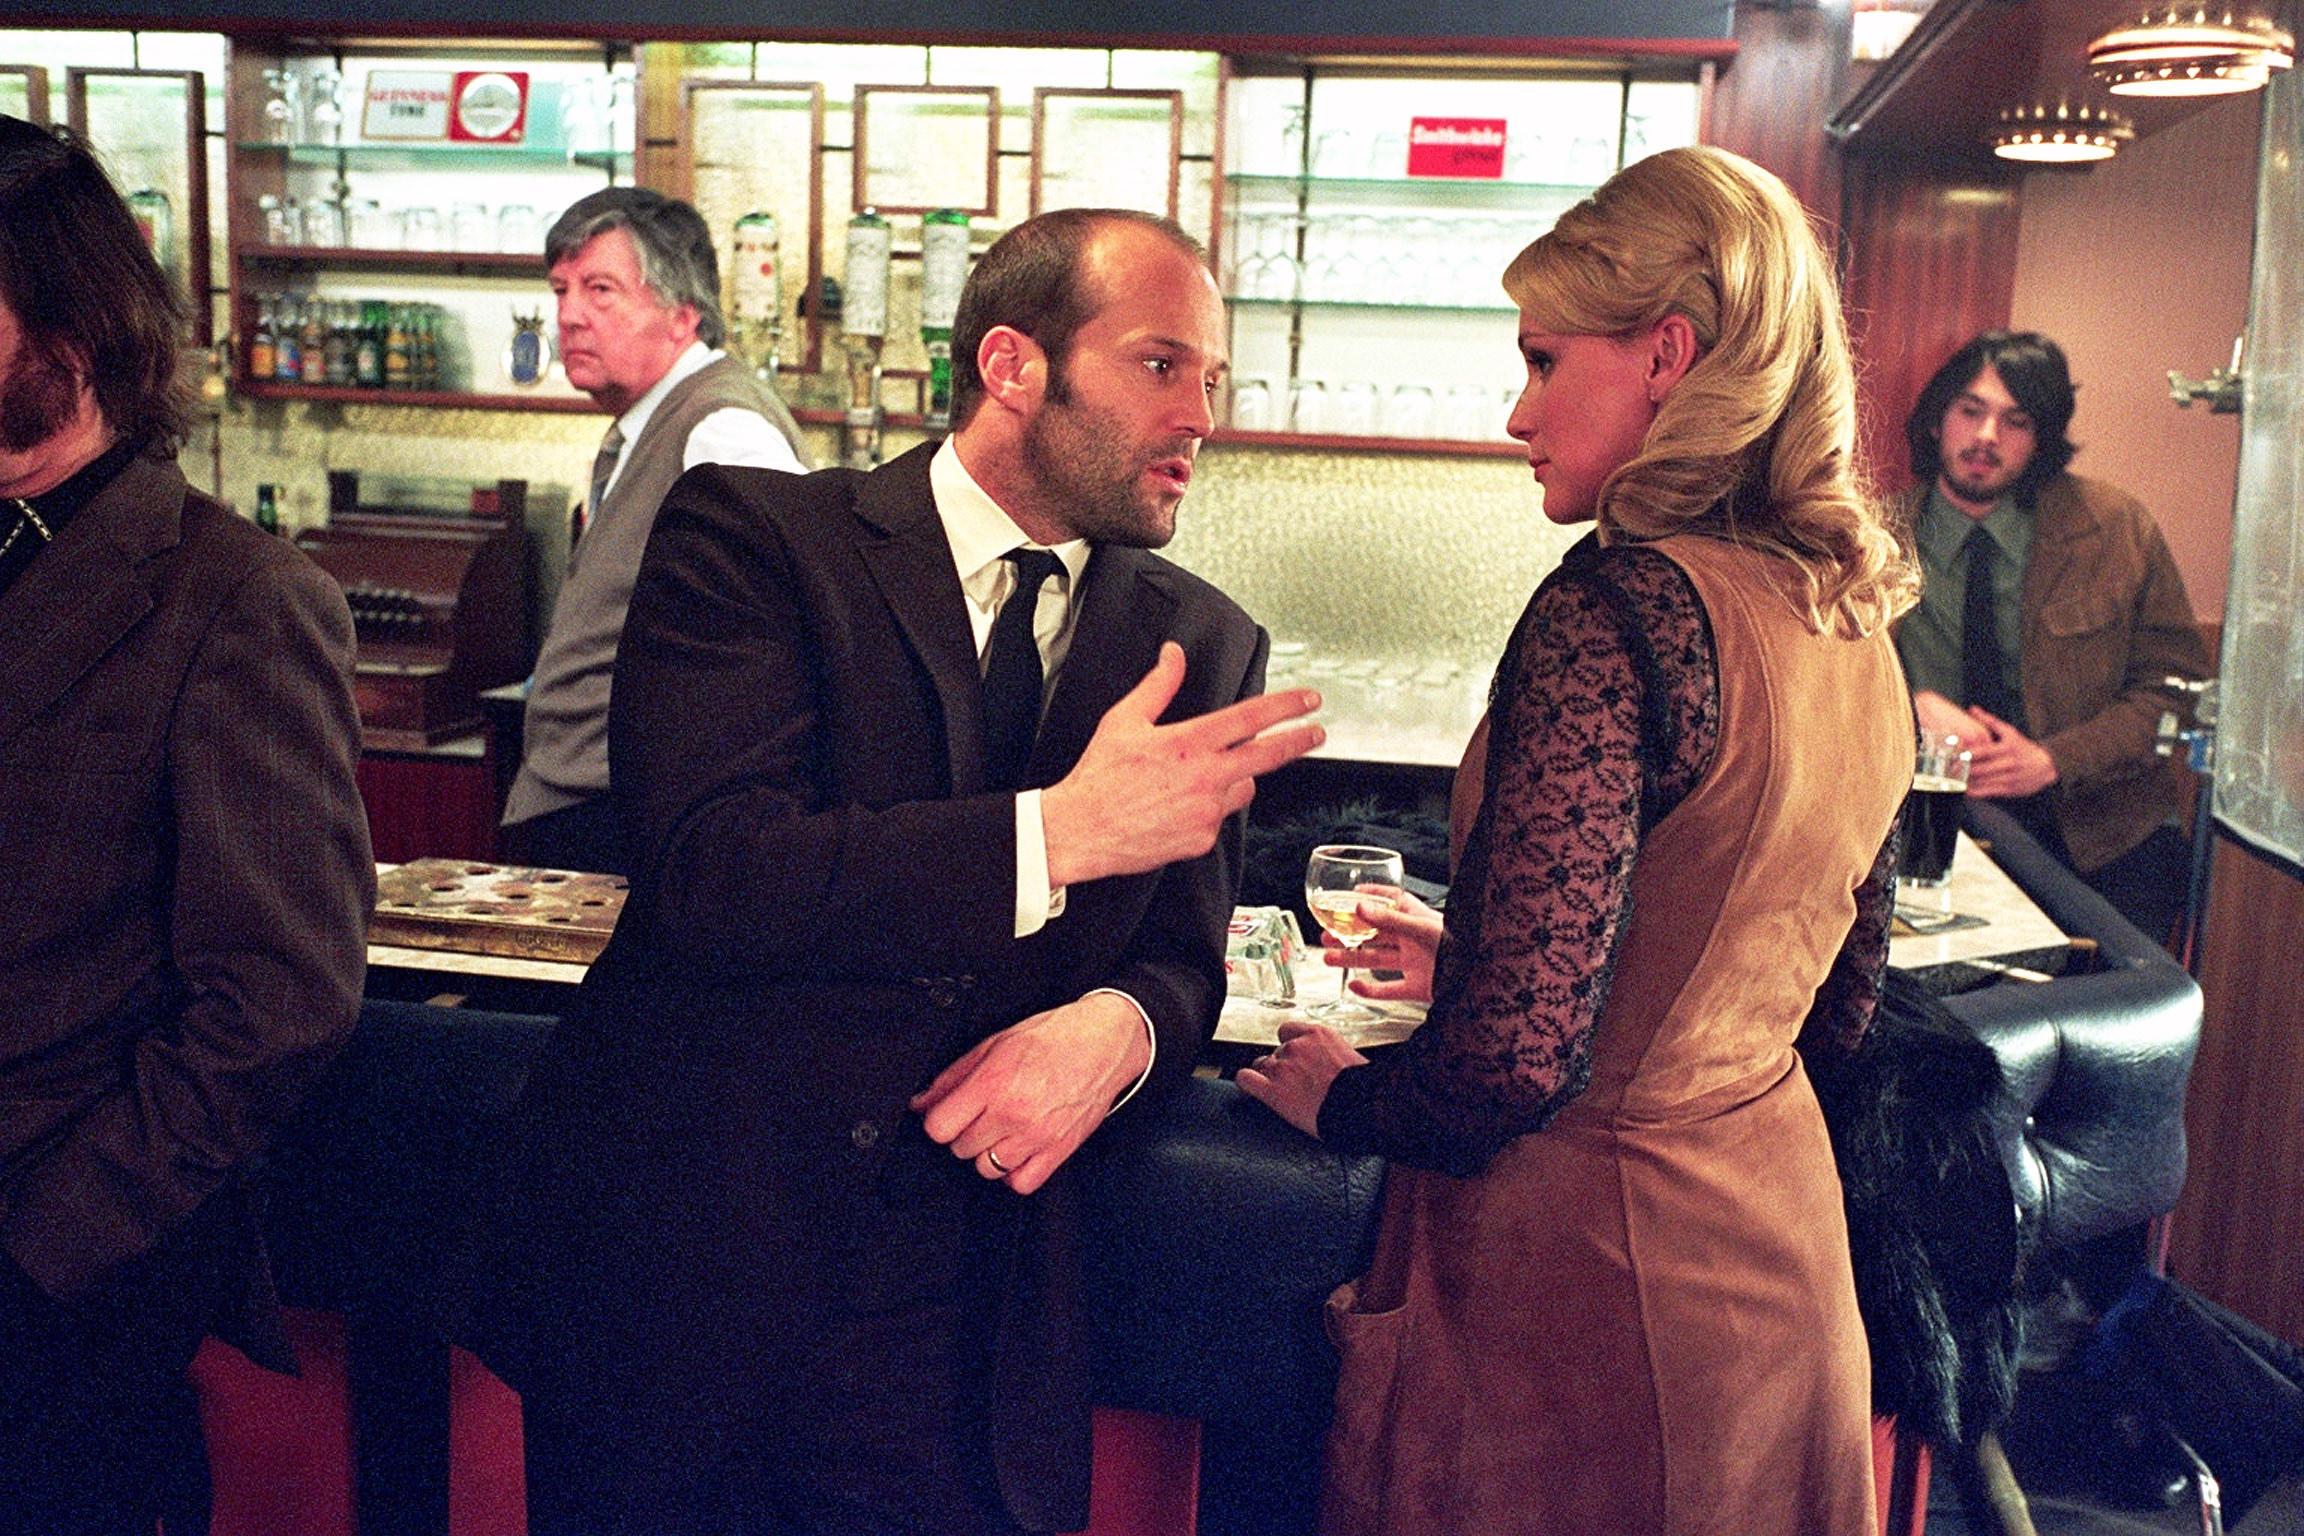 Jason Statham talking to Hattie Morahan while at a bar